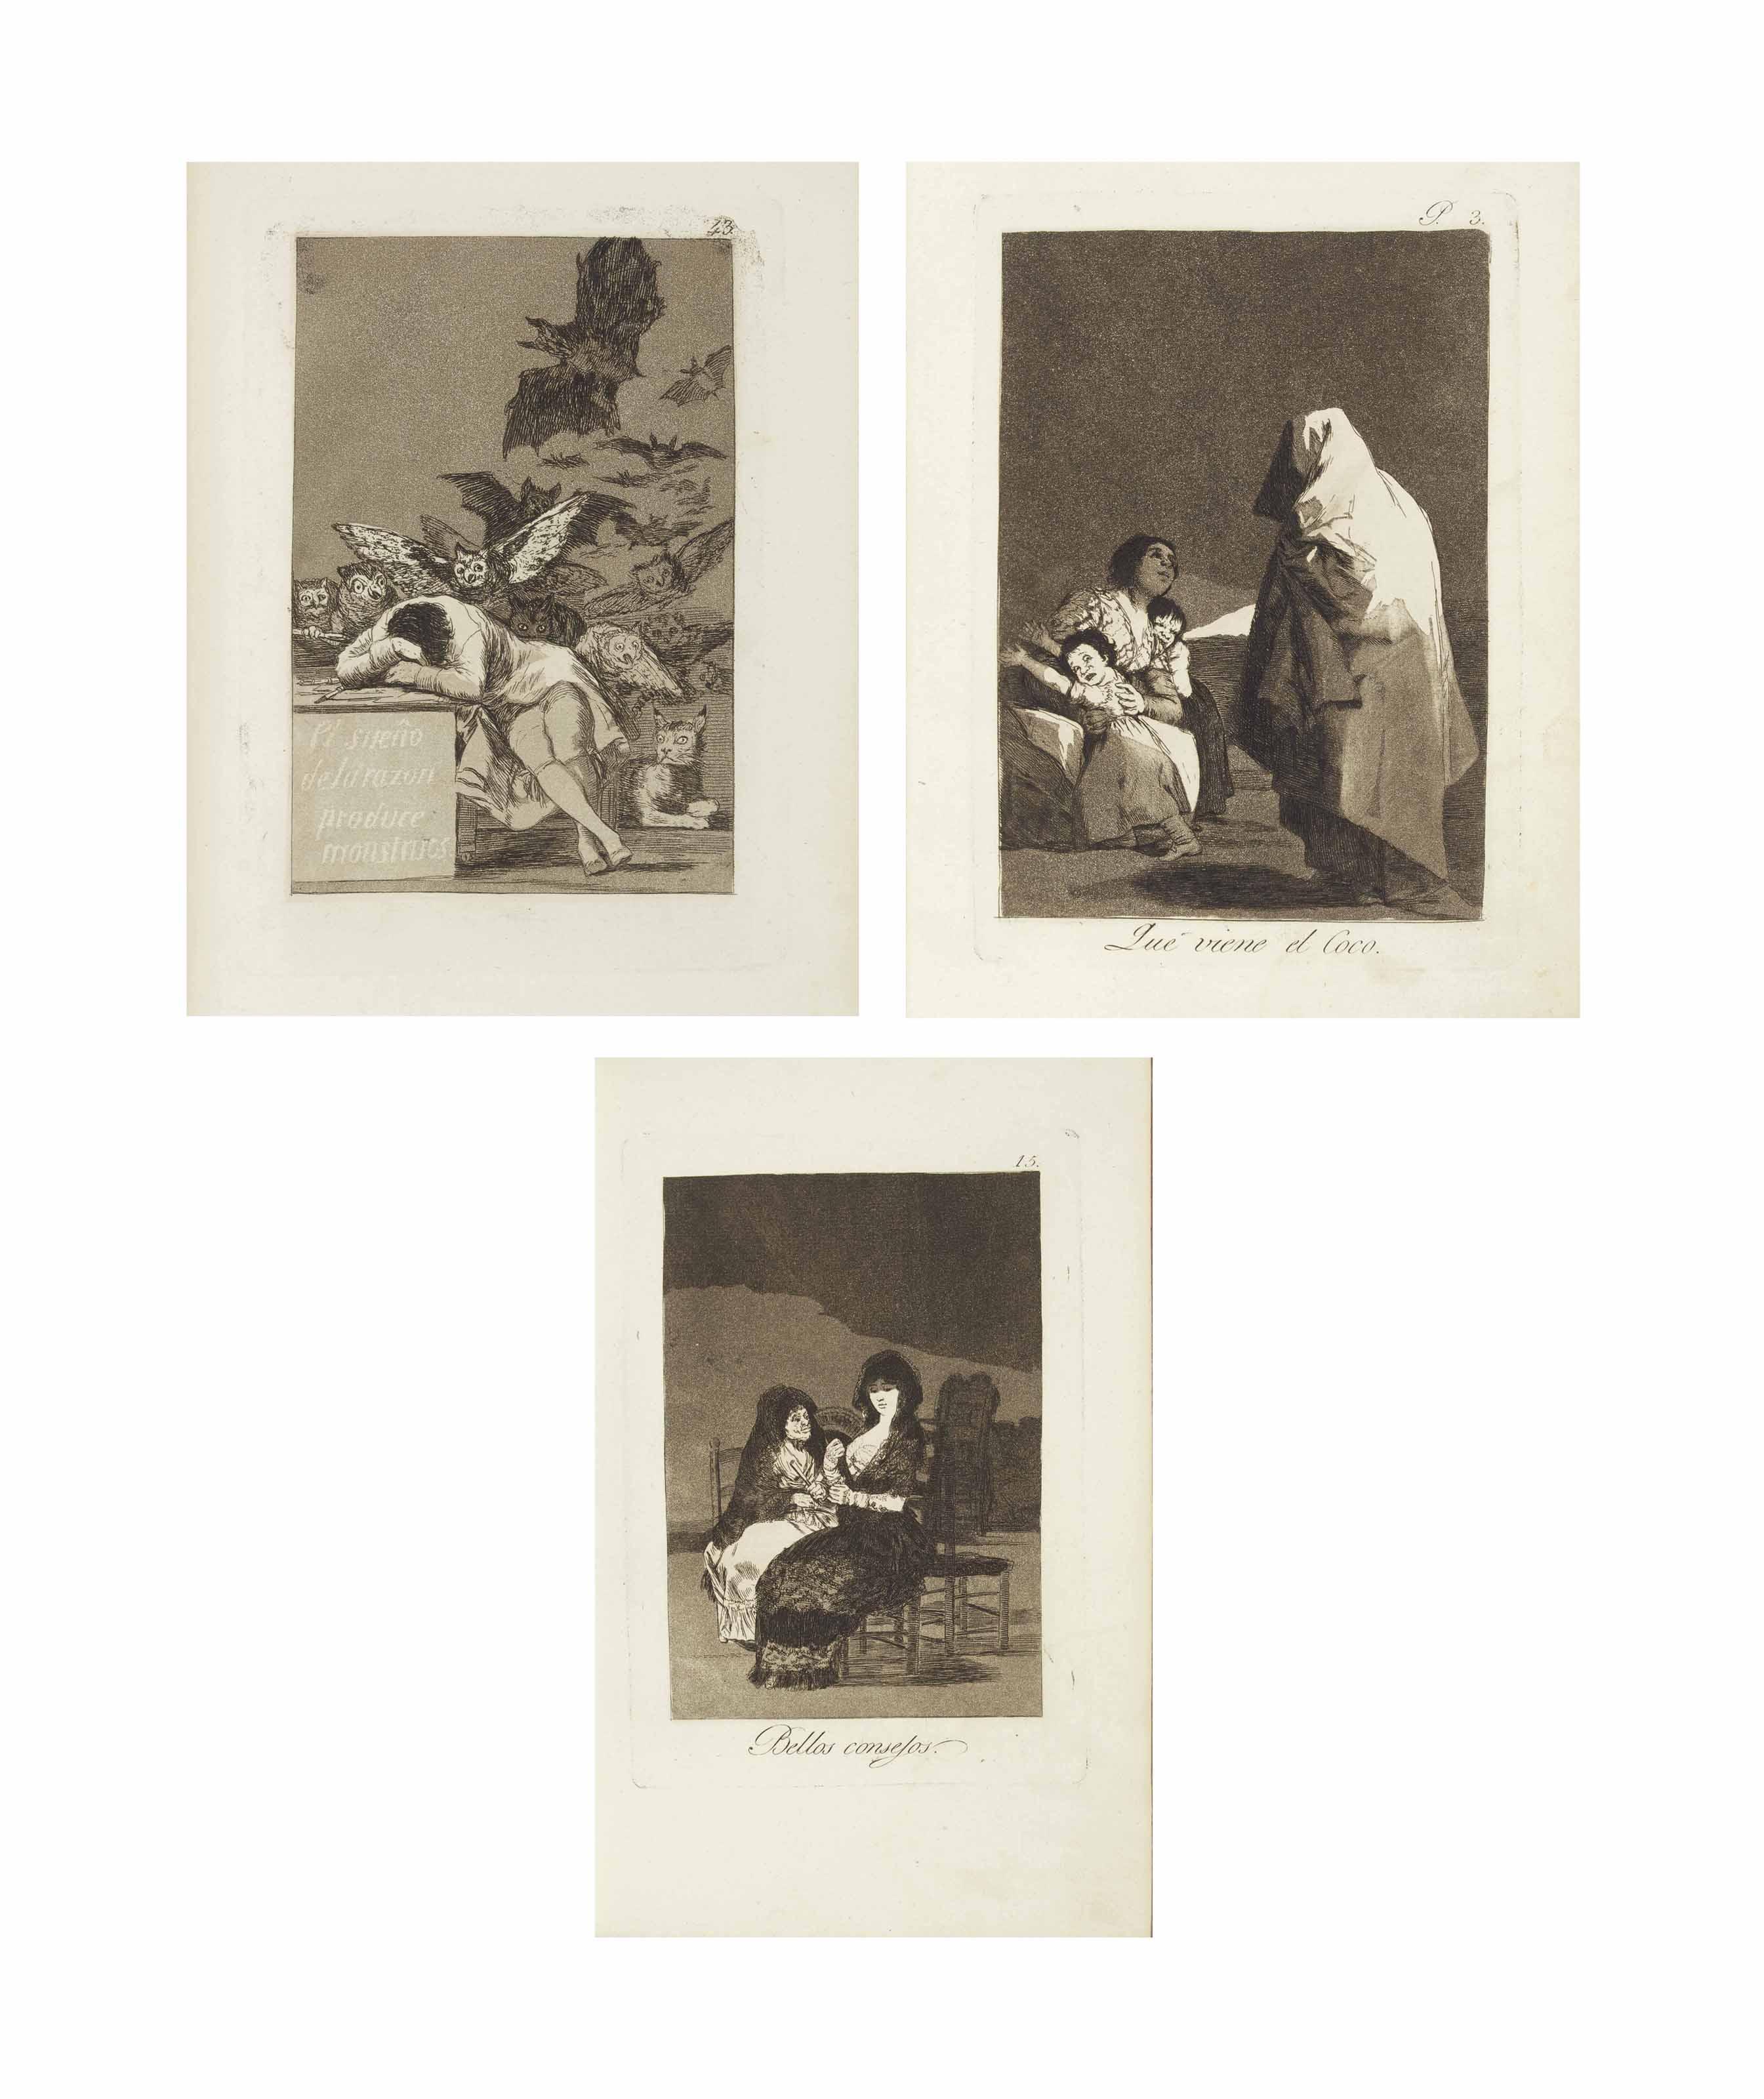 GOYA Y LUCIENTES, Francisco (1746-1828). [Los Caprichos. Madrid: possibly printed by Rafael Esteve for the artist, 1799.]